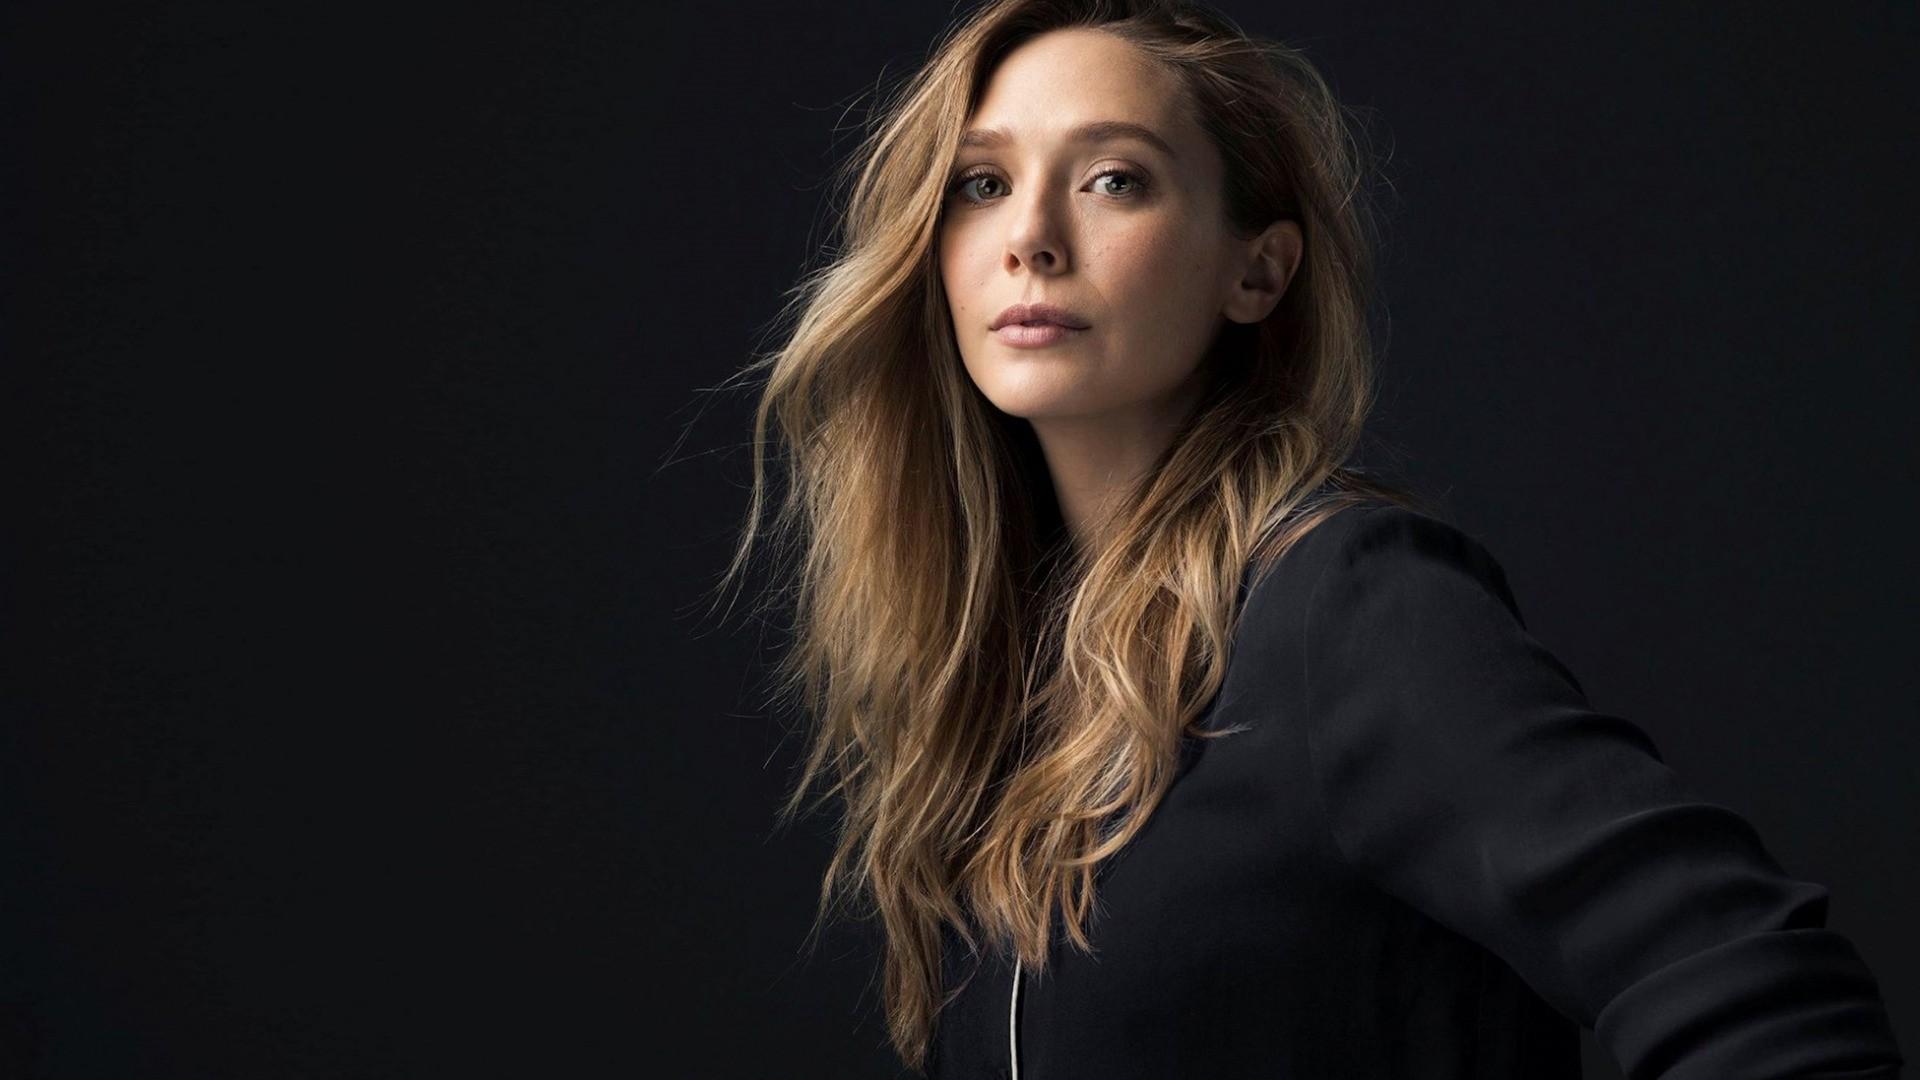 Elizabeth Olsen Free Download Wallpaper